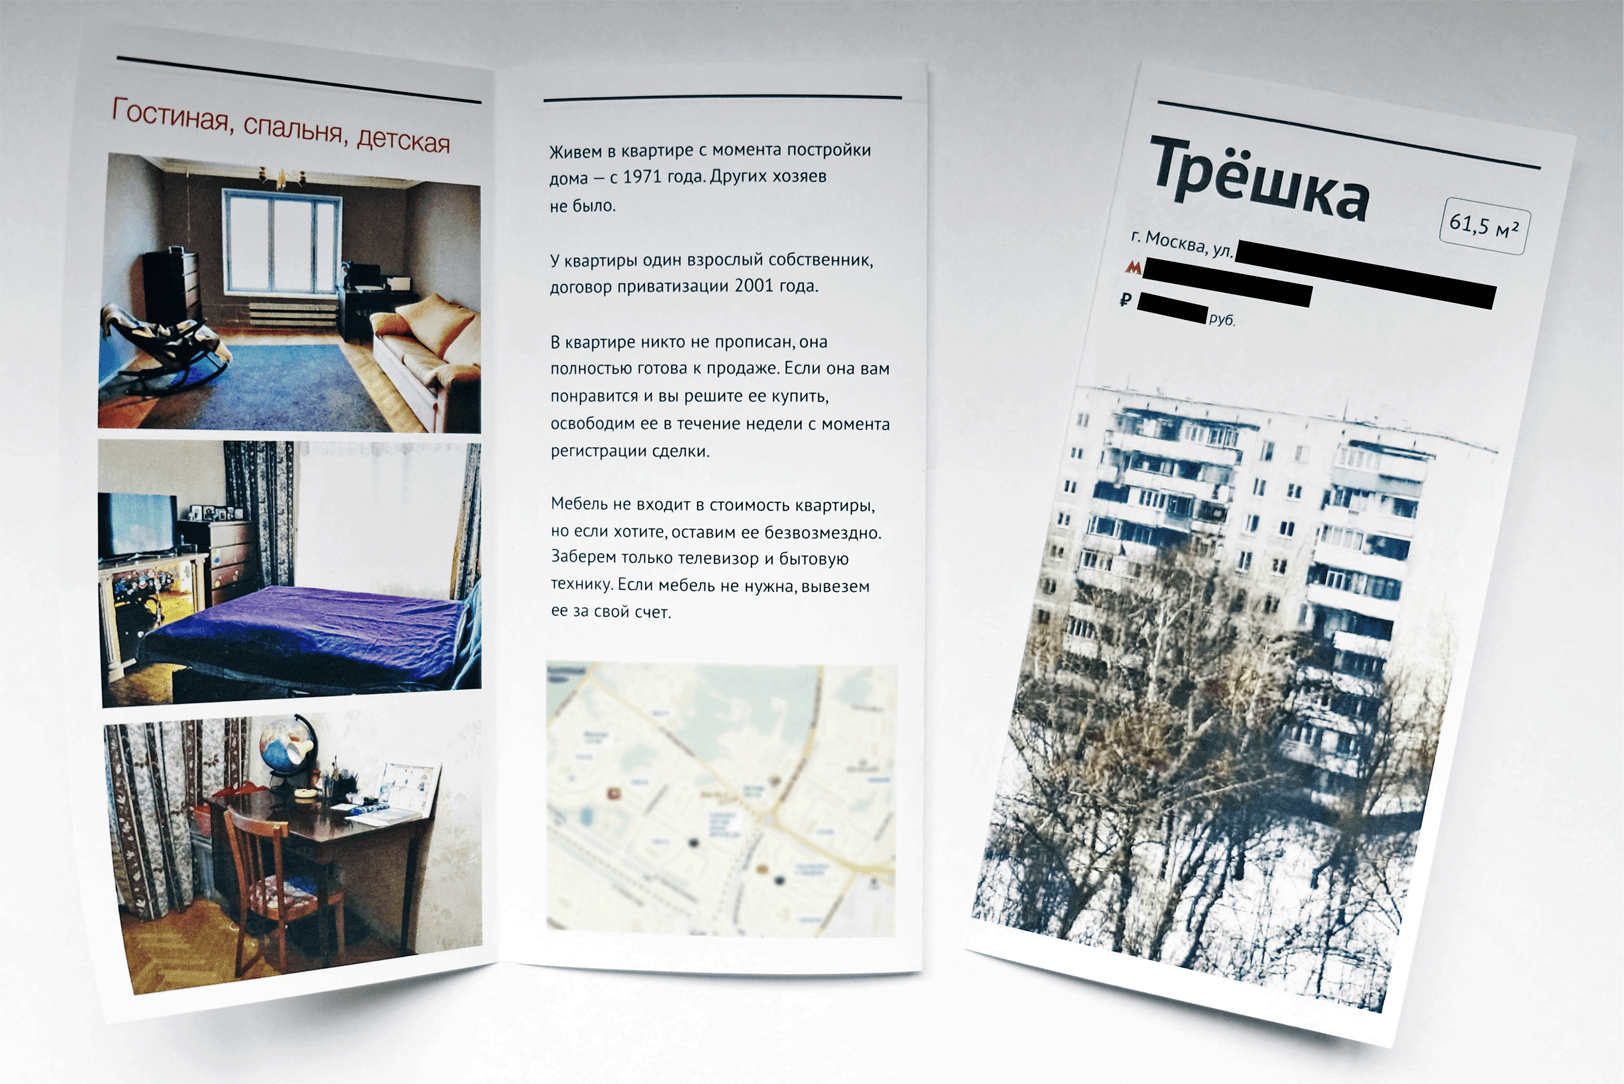 Шаблон брошюр для {Пэйджес}(https://www.dropbox.com/s/rmbzv9tktzhwo29/Шаблон_буклета.template?dl=1) и {Ворда}(/media/flat.dotx)